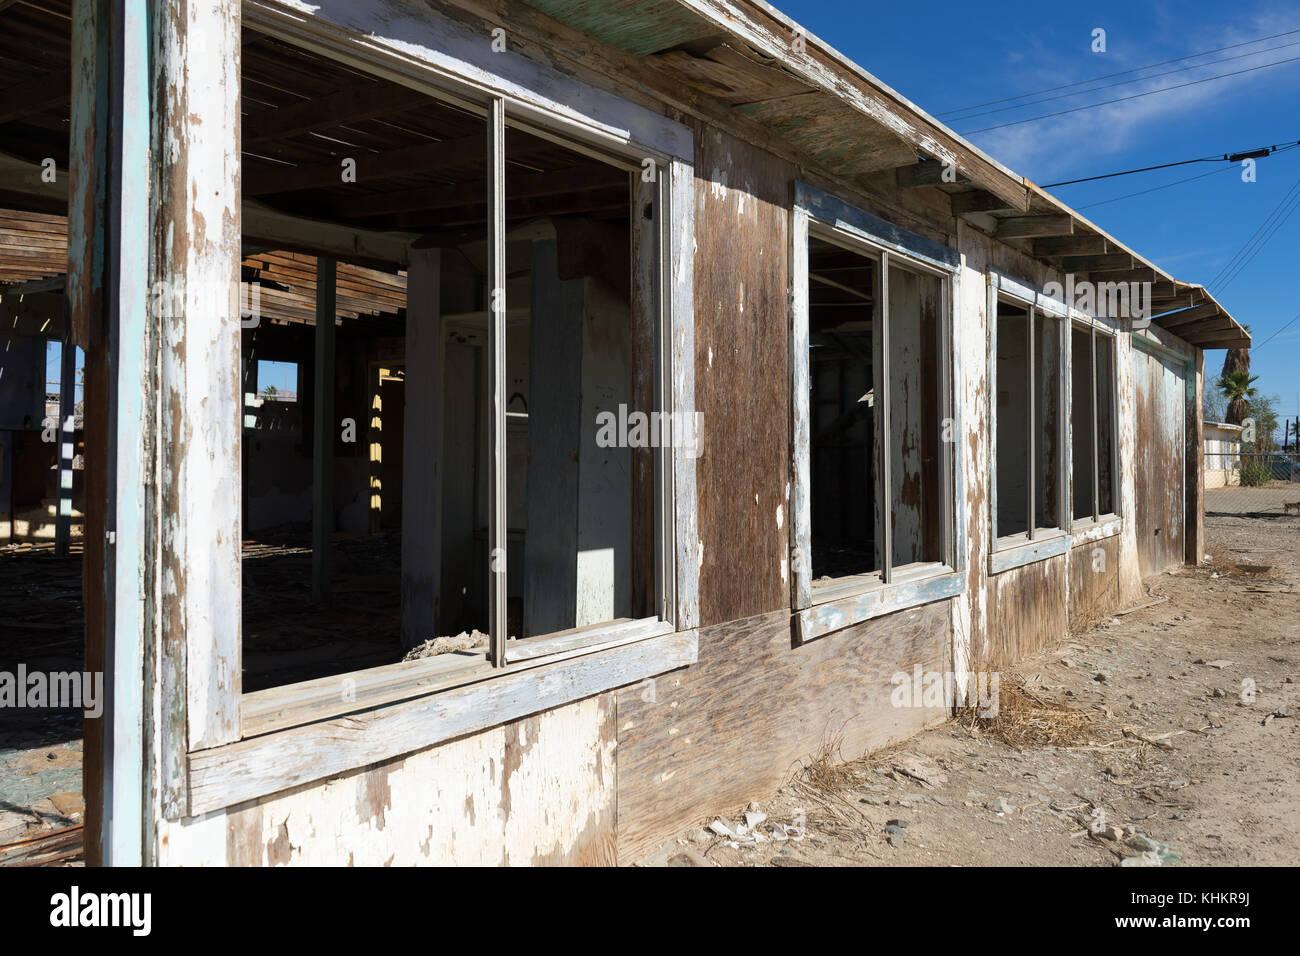 the abandoned Bombay Beach California - Stock Image